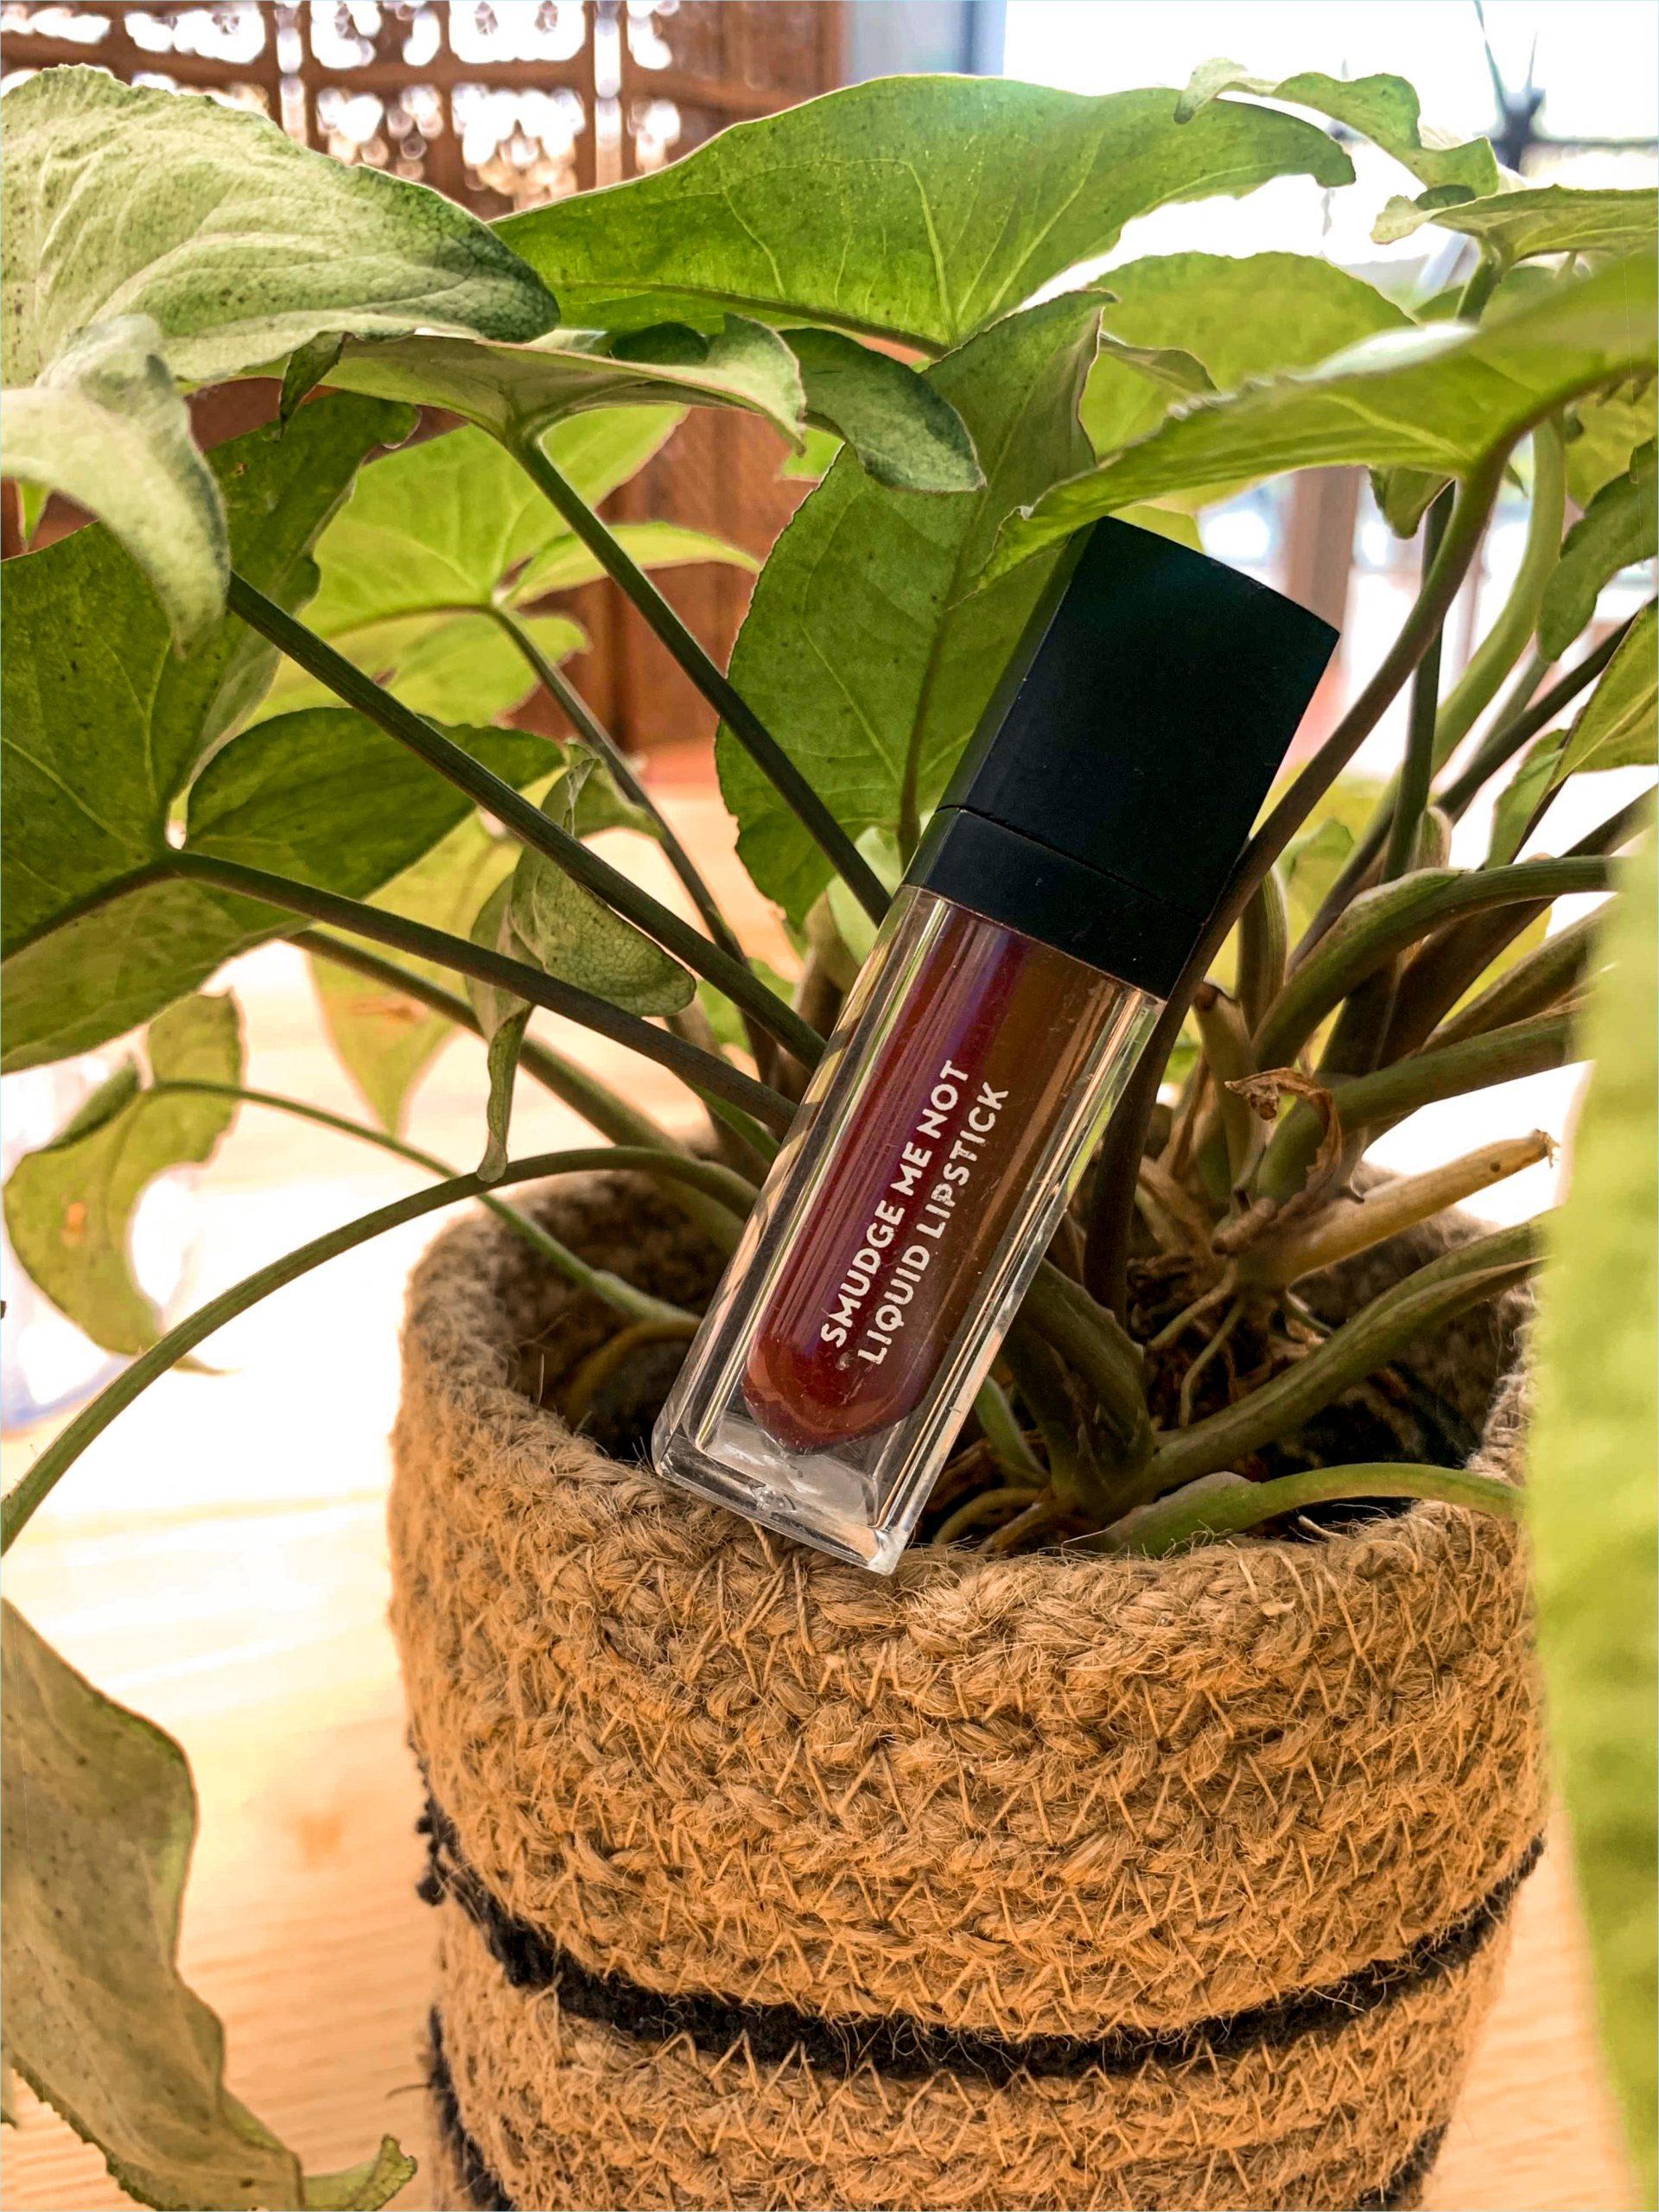 SUGAR Smudge Me Not Liquid Lipstick review3